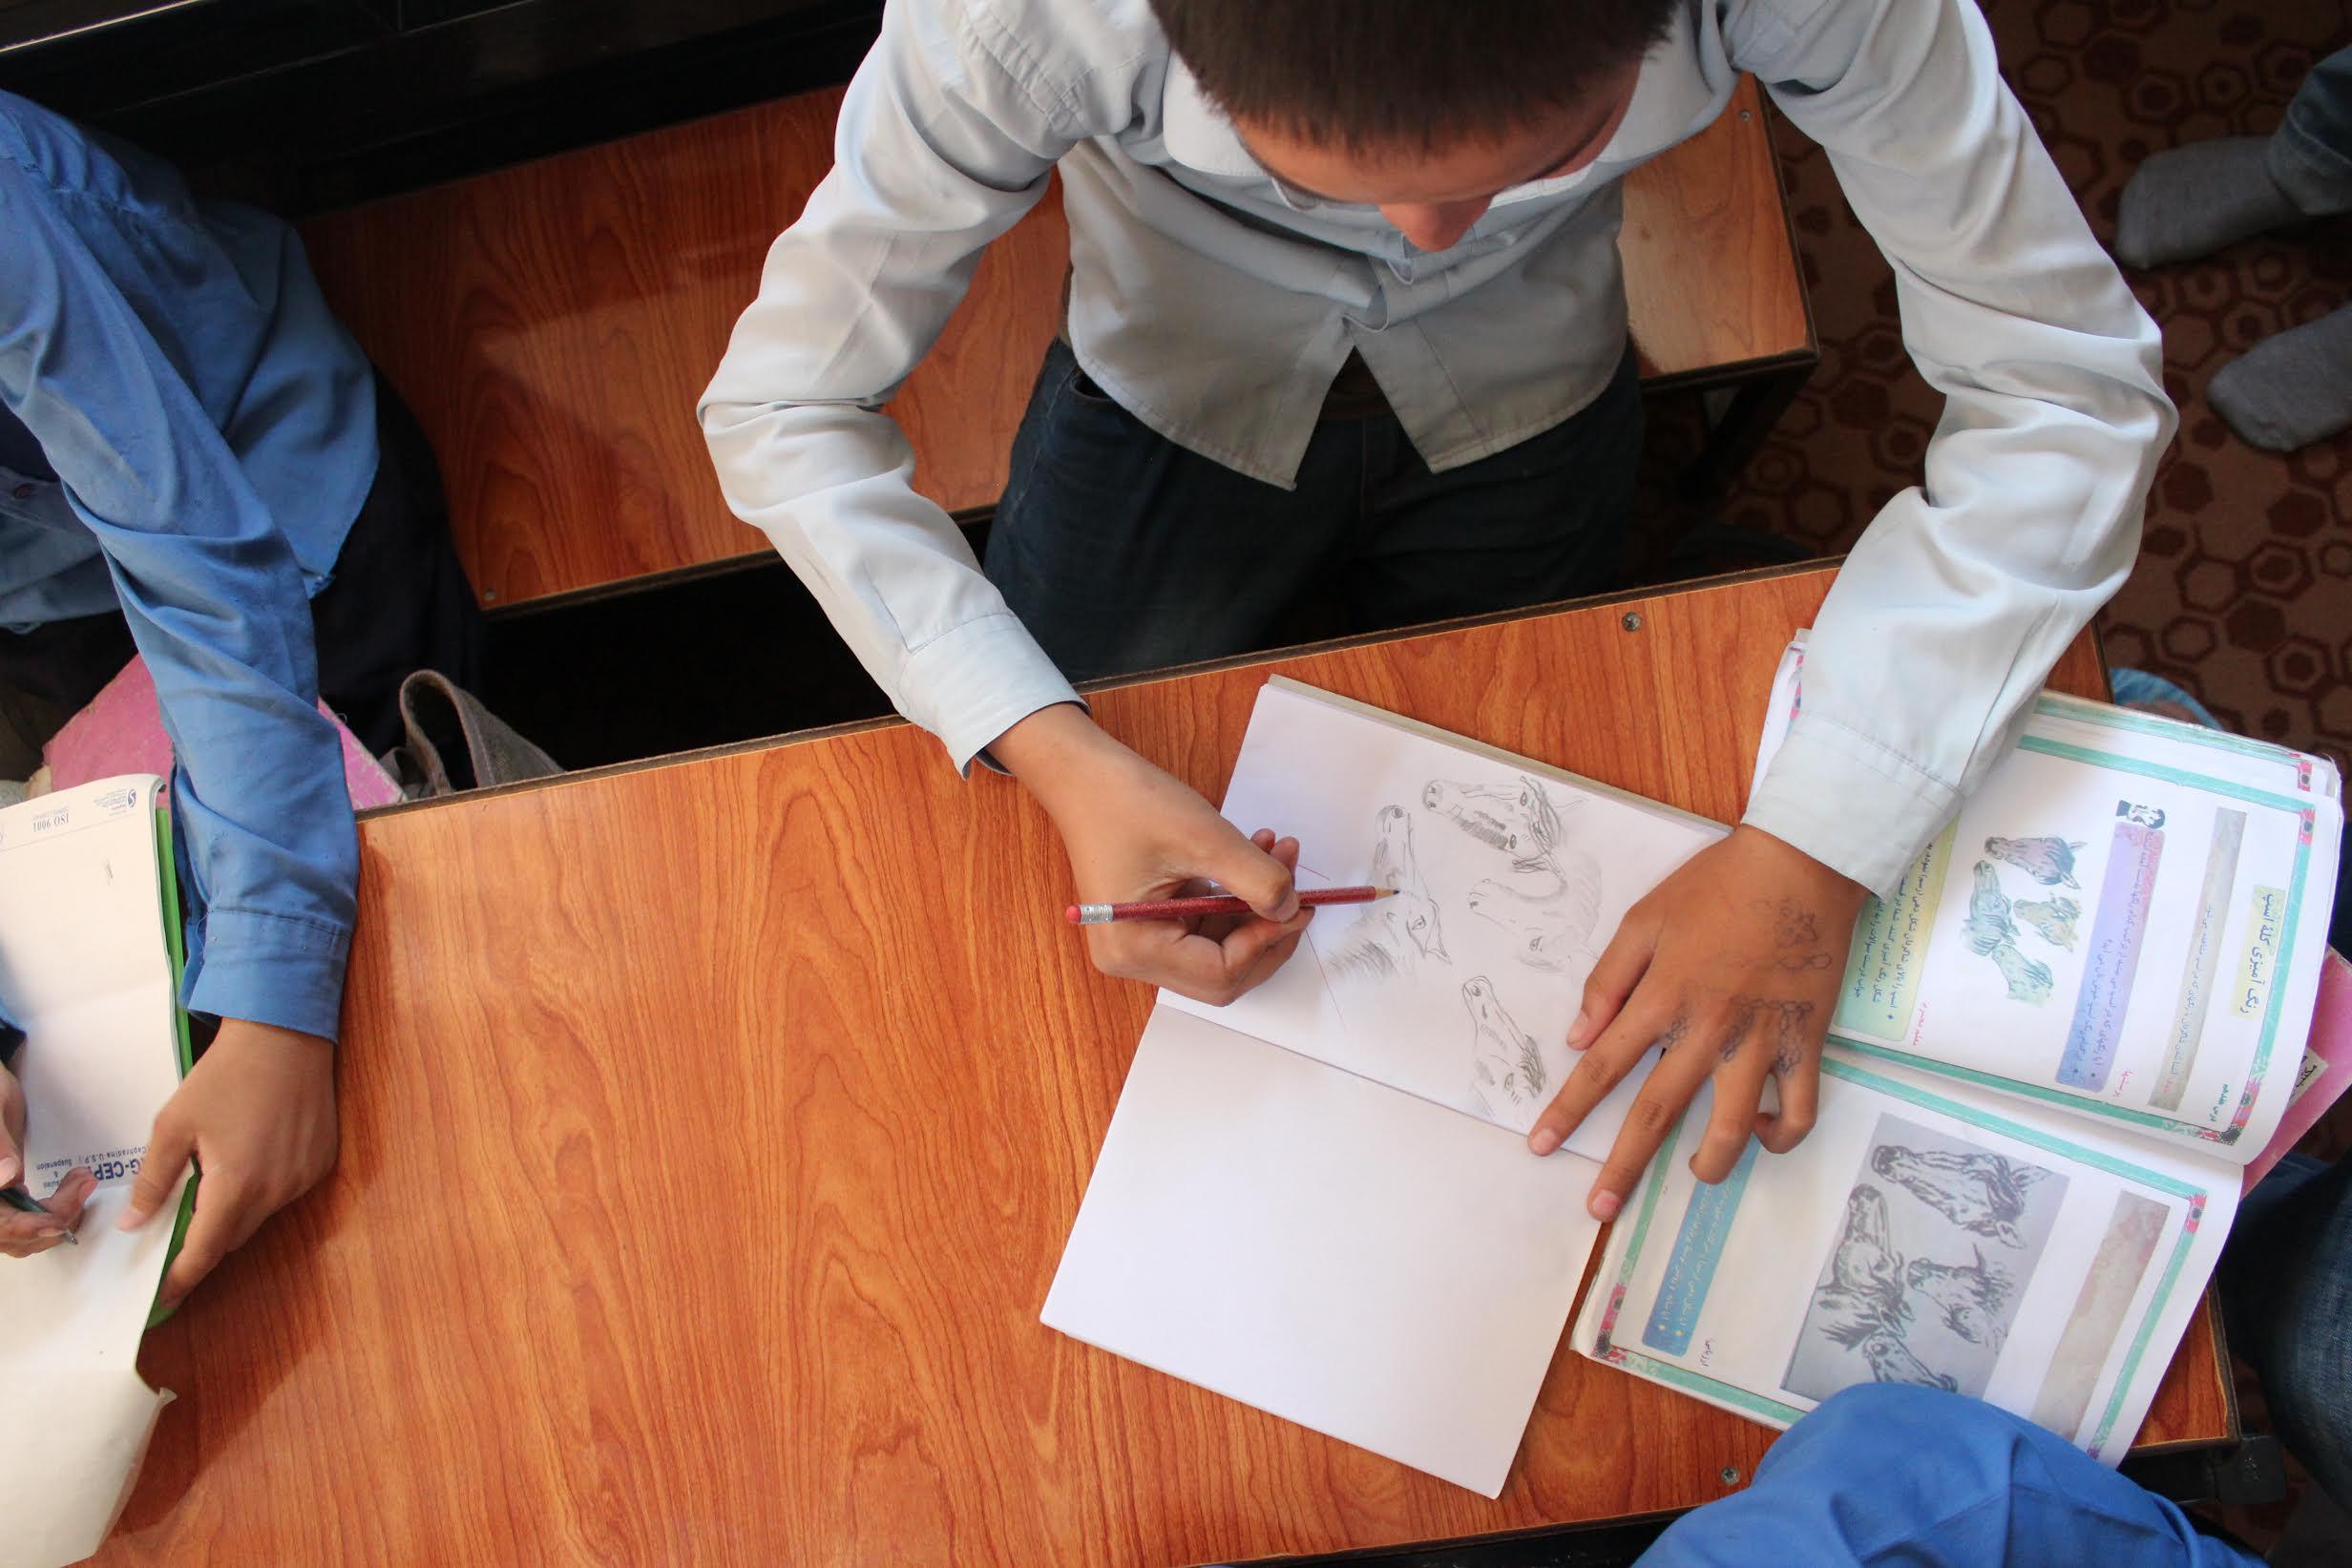 Nazanin - #3022 | FemaleAge When Starting School: 8